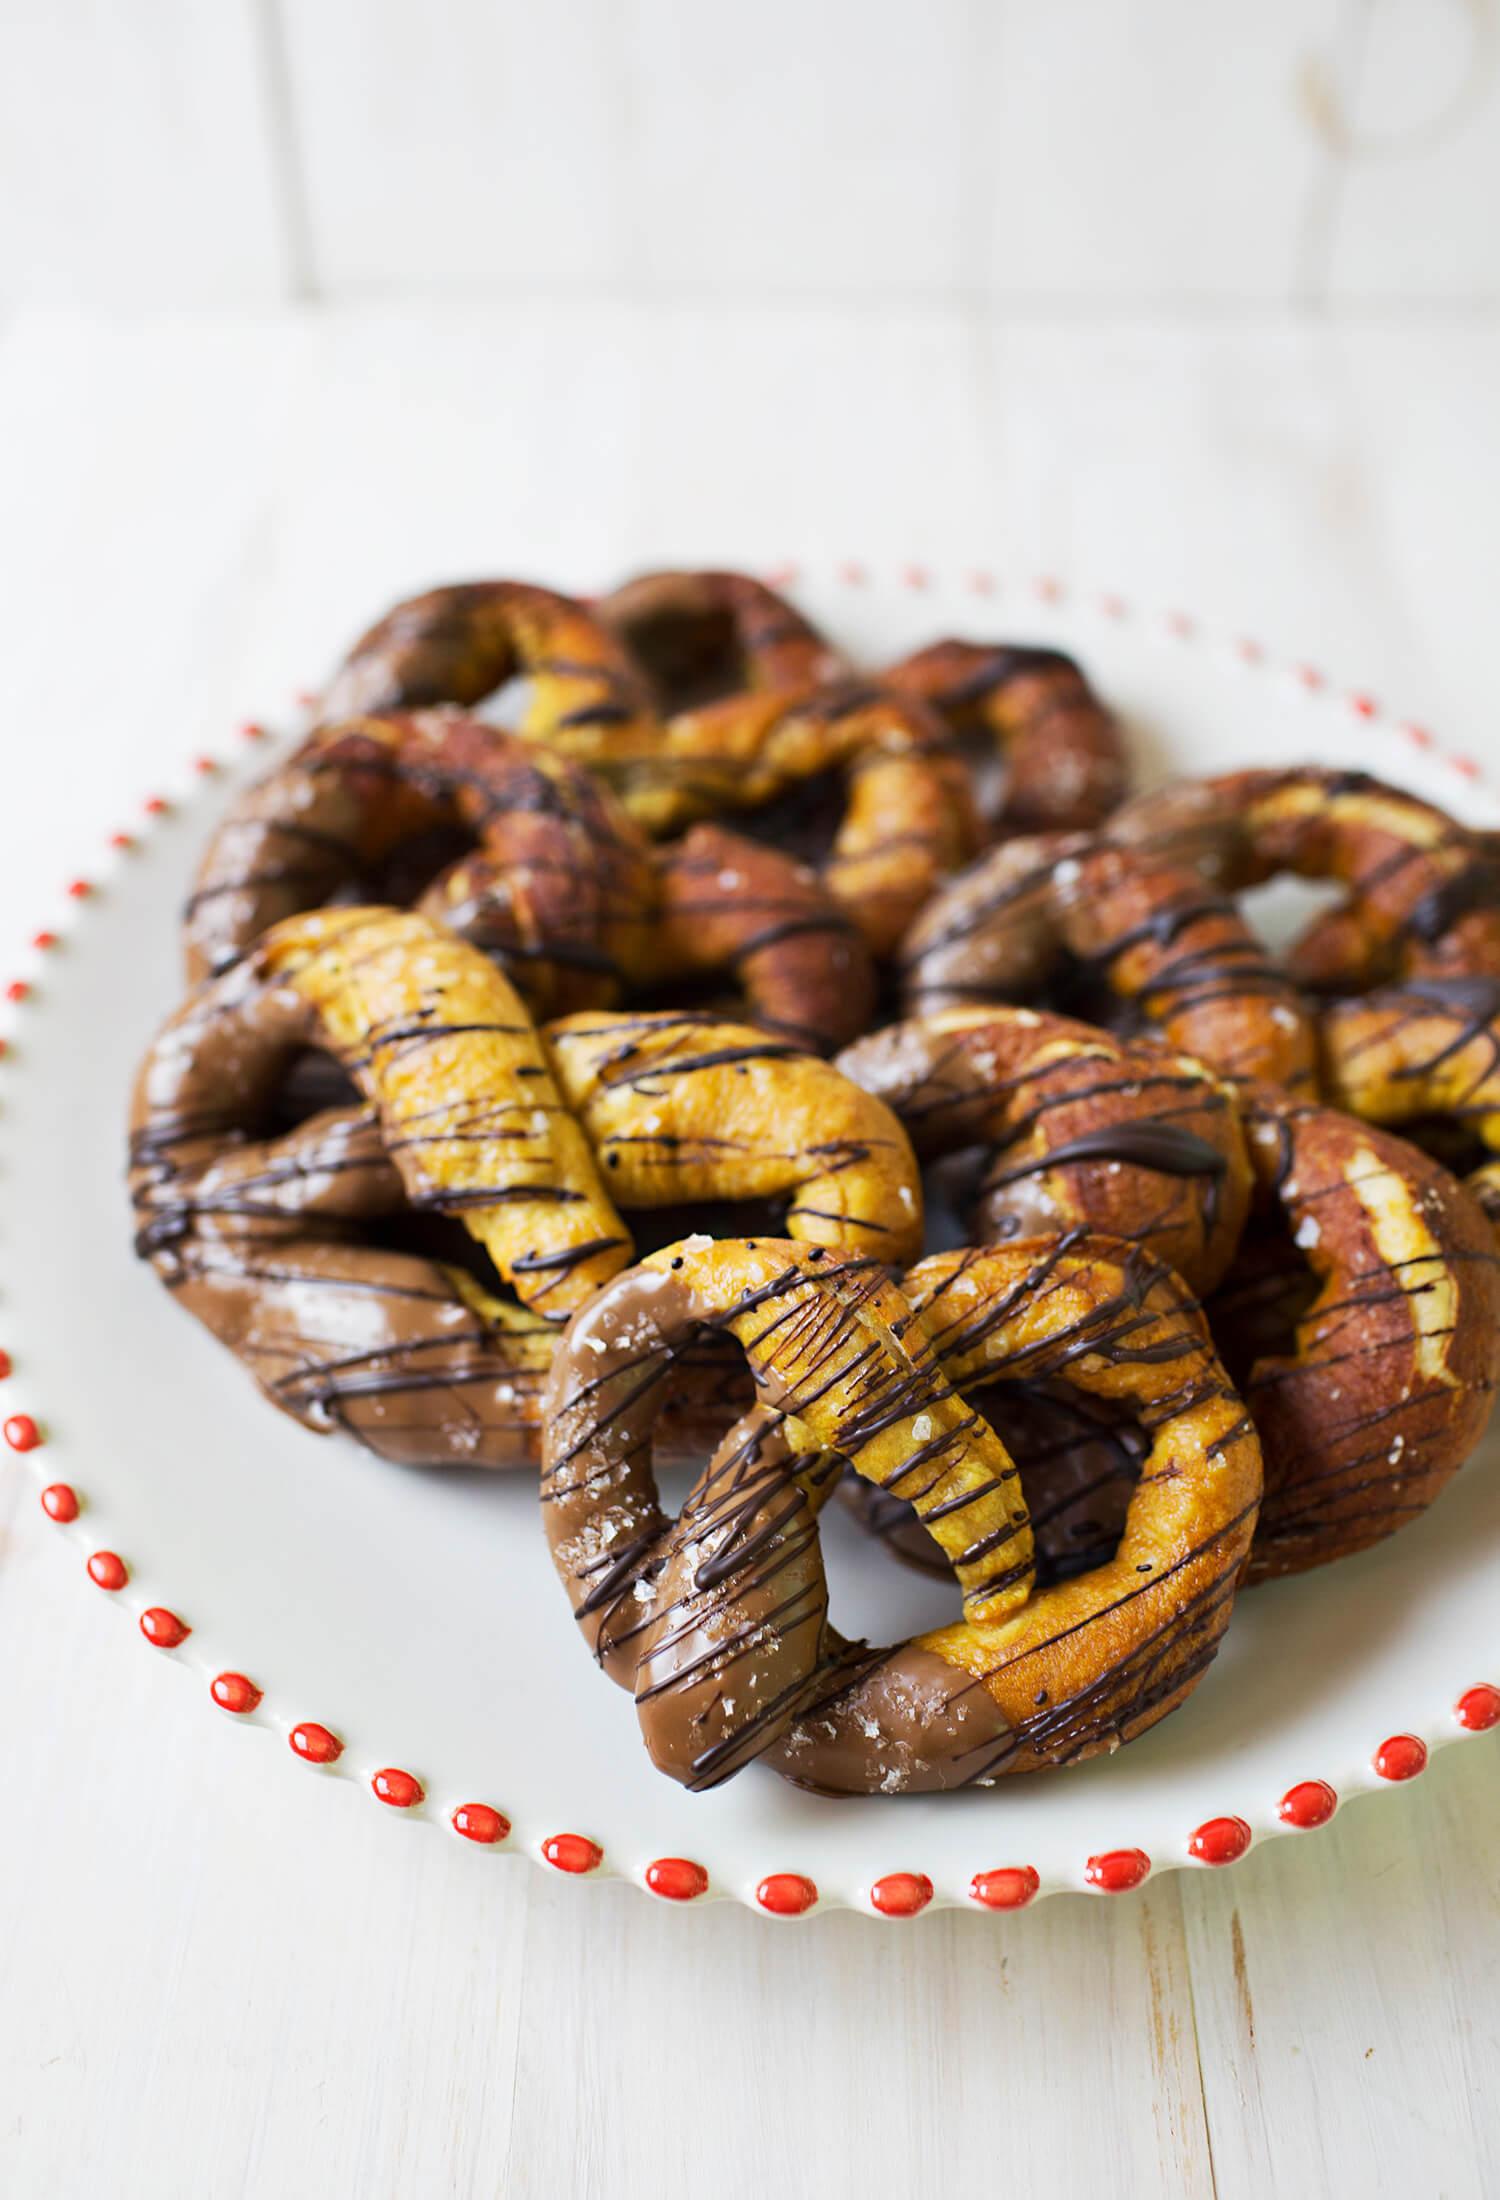 Chocolate Dipped Dessert Pretzels